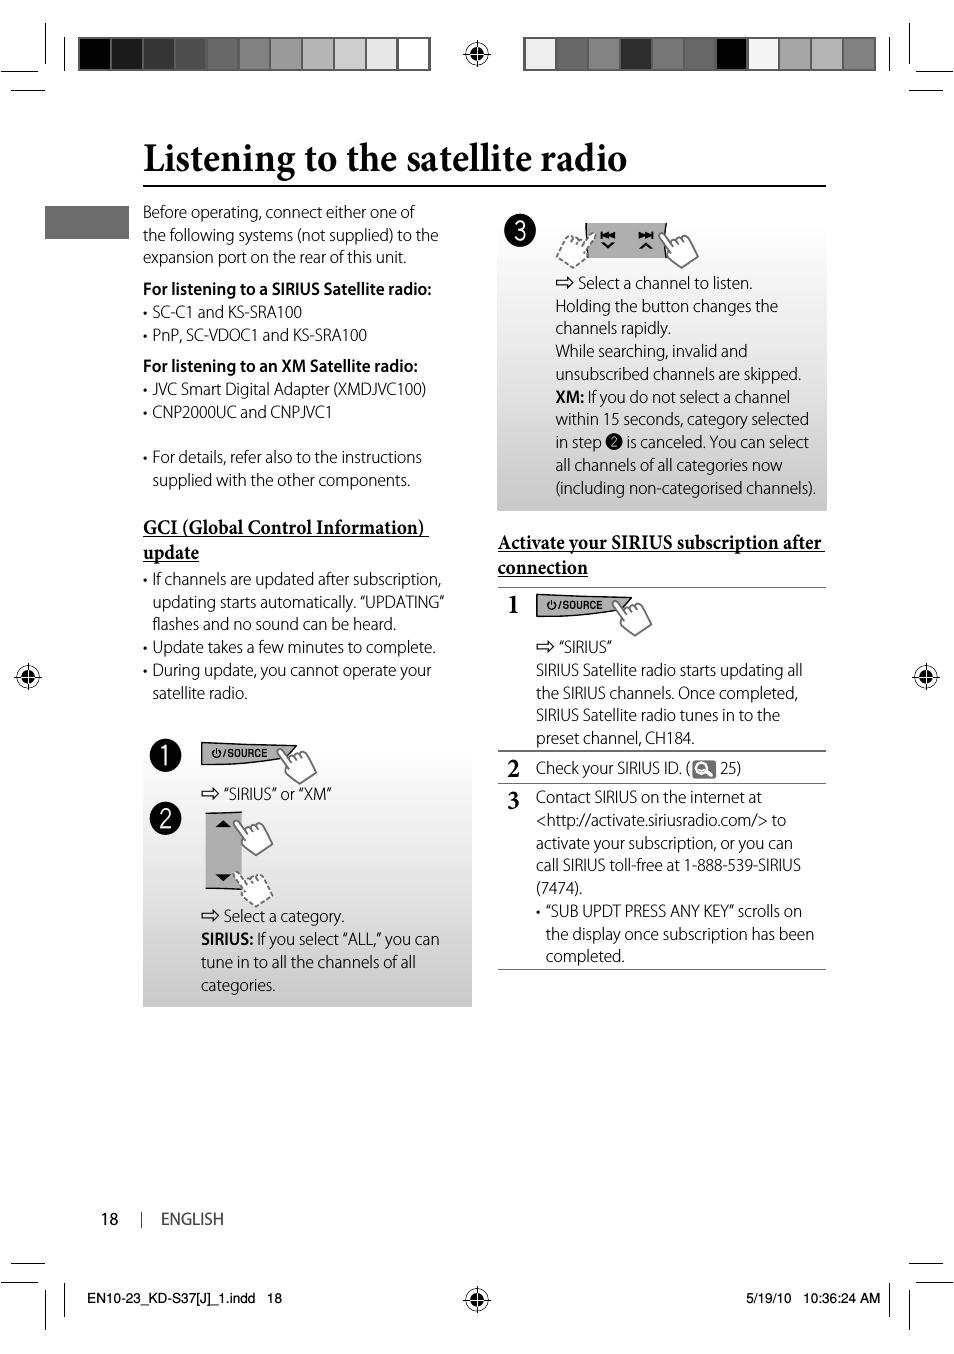 jvc kd s37 page18 png